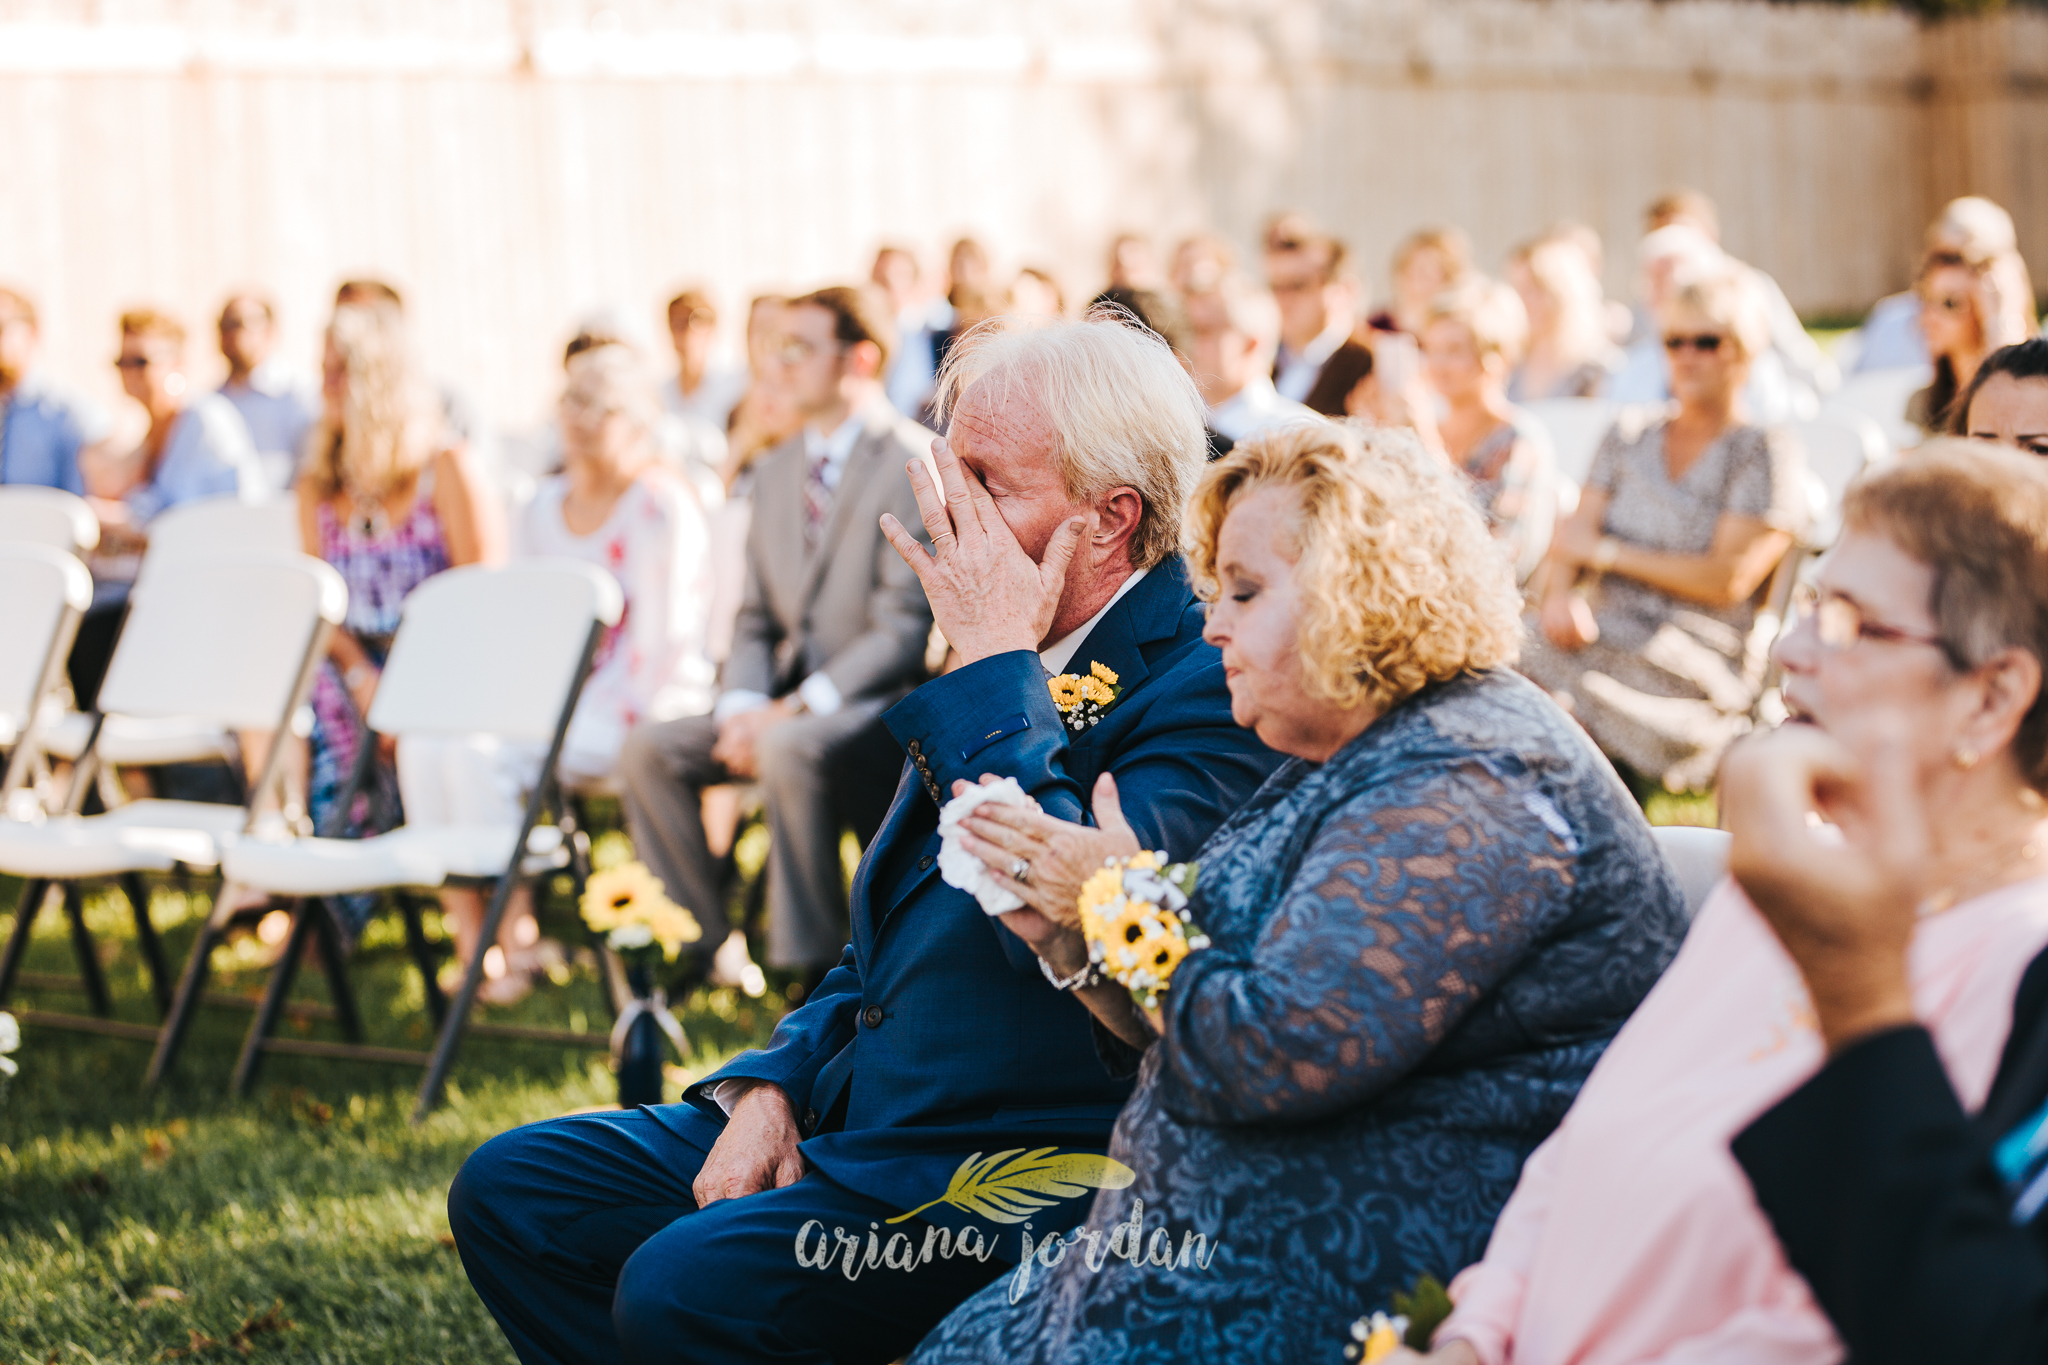 069 Ariana Jordan Photography -Moonlight Fields Lexington Ky Wedding Photographer 4564.jpg